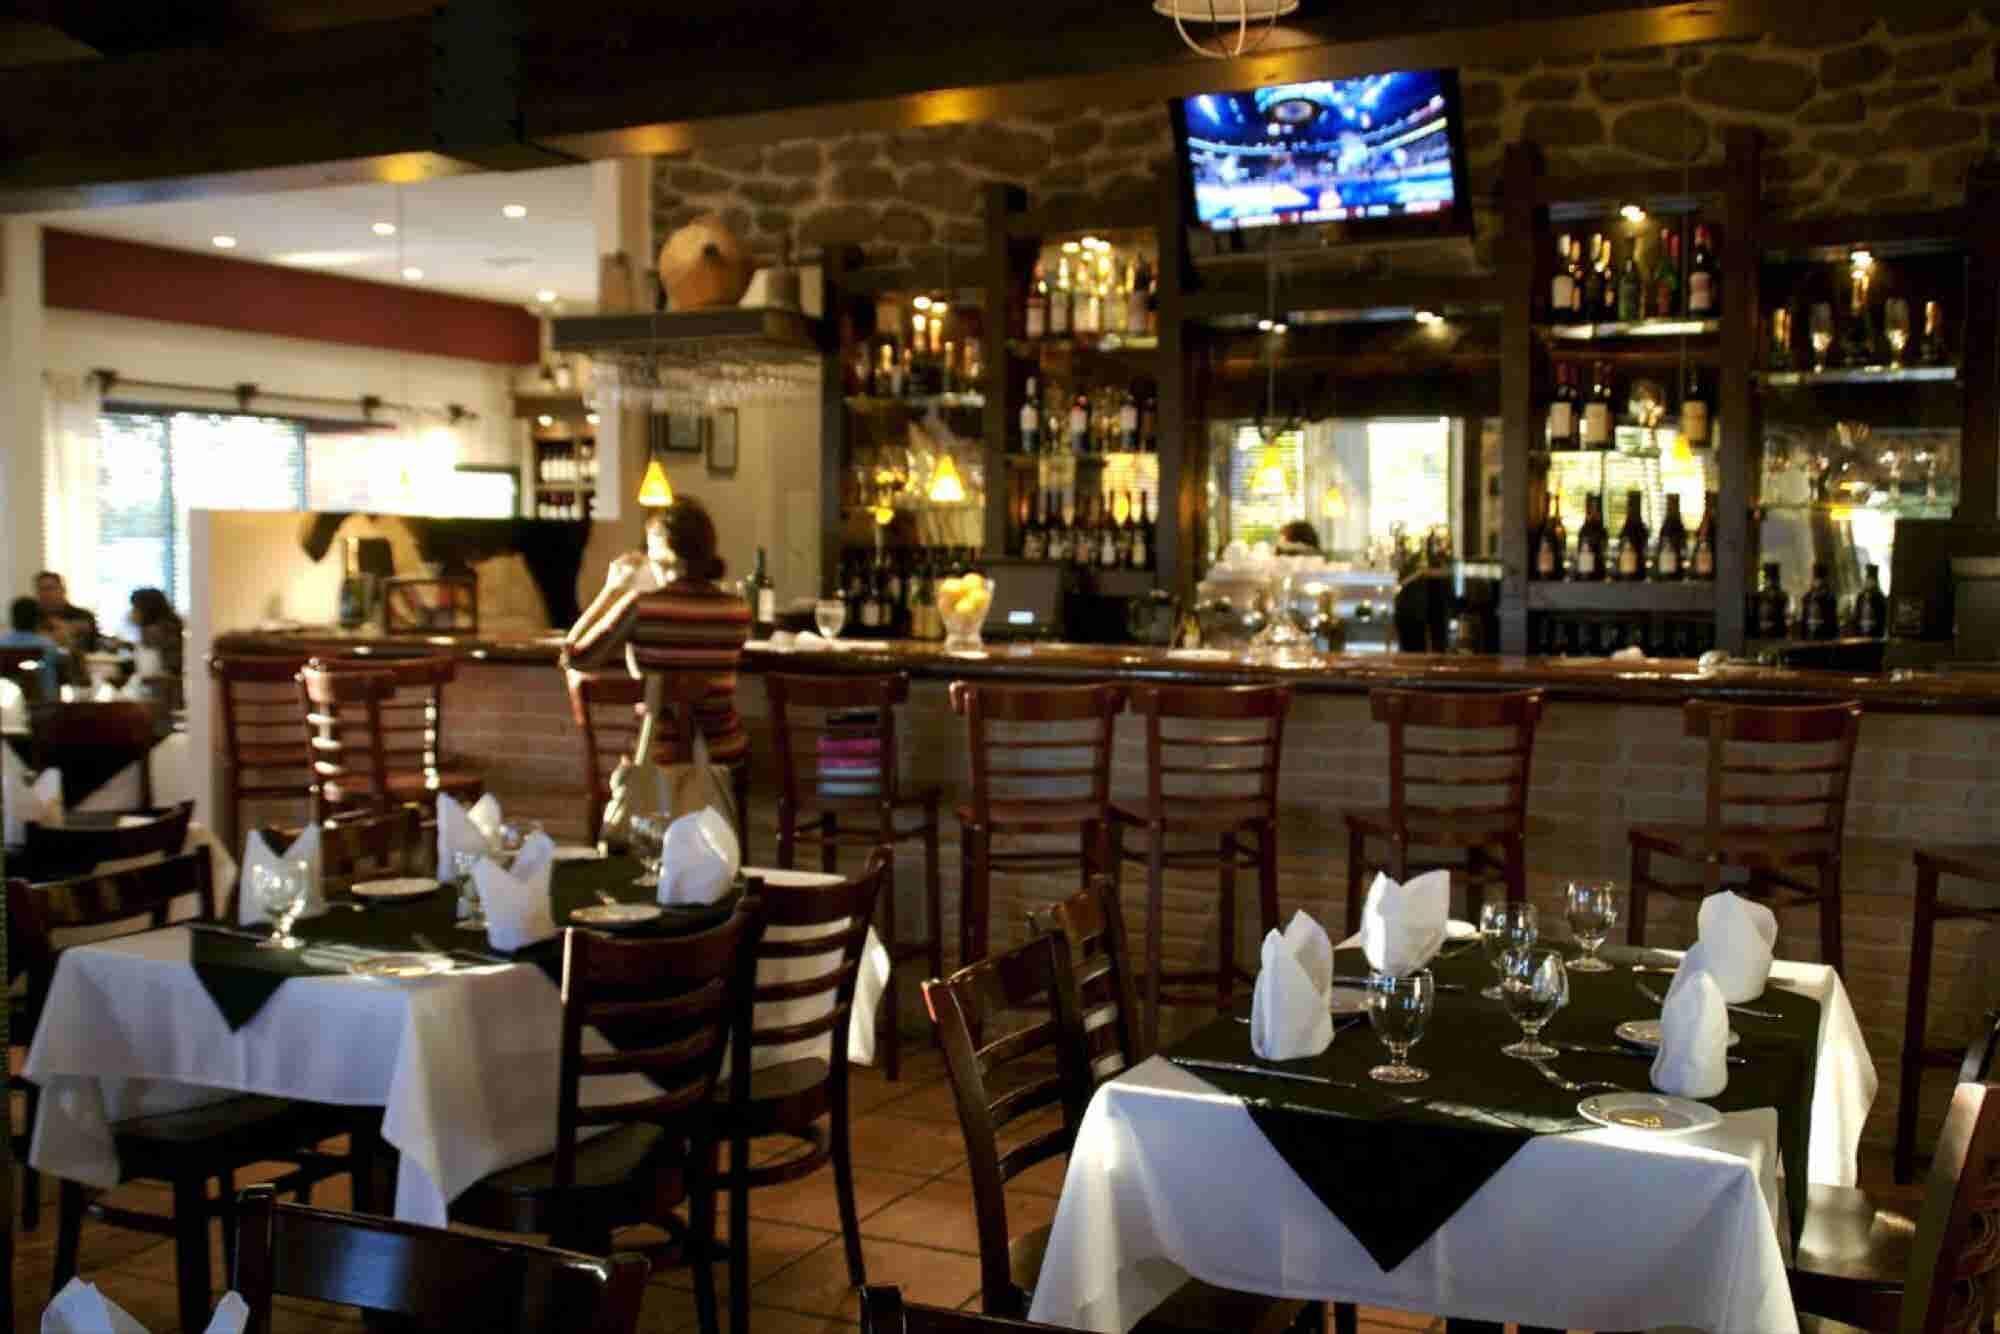 ¿Quieres poner un restaurante? ¡Asiste a Exporestaurantes 2018!